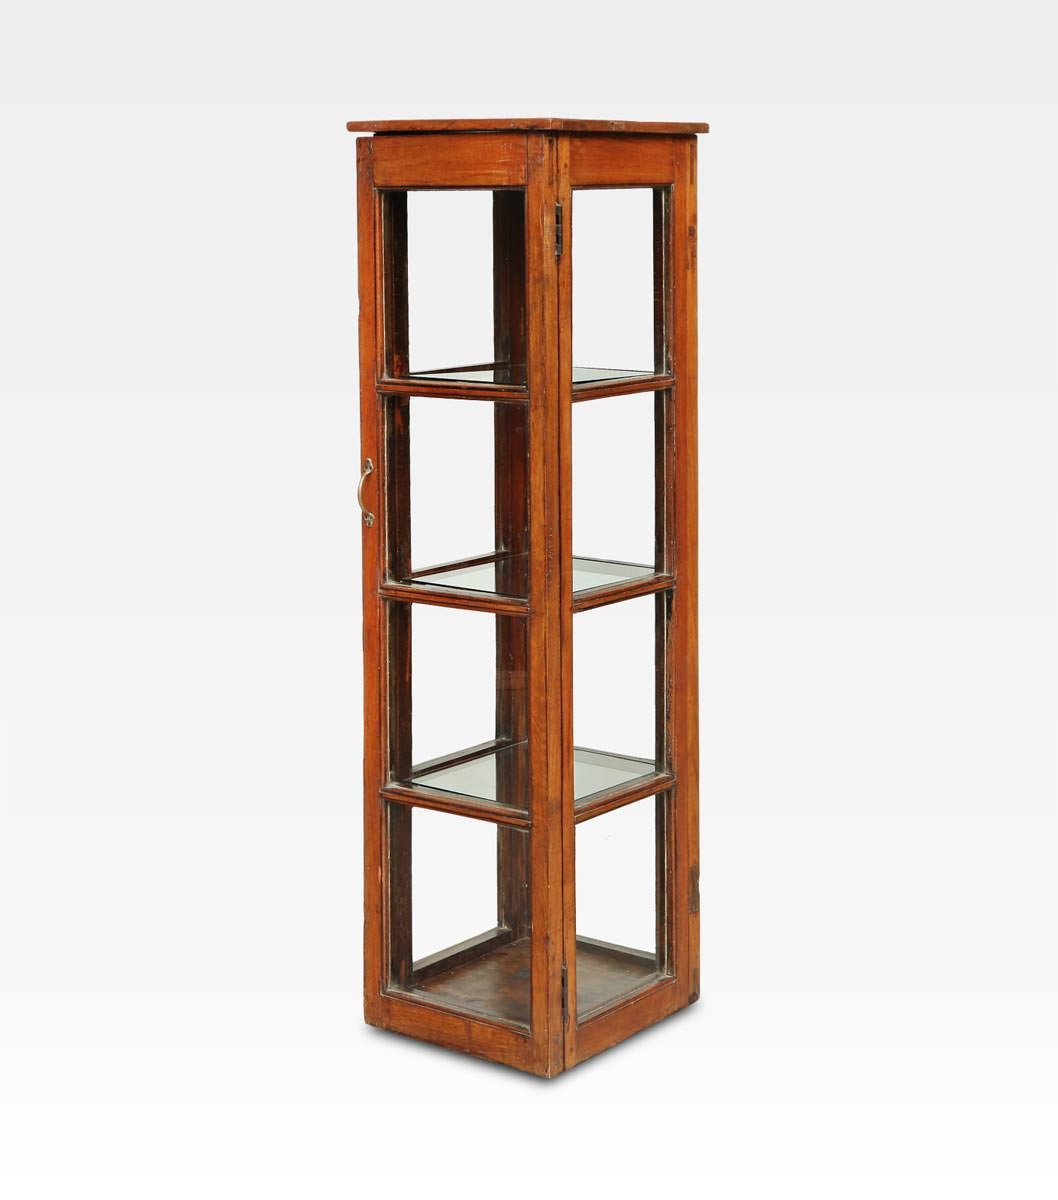 legno teak - Ecosia